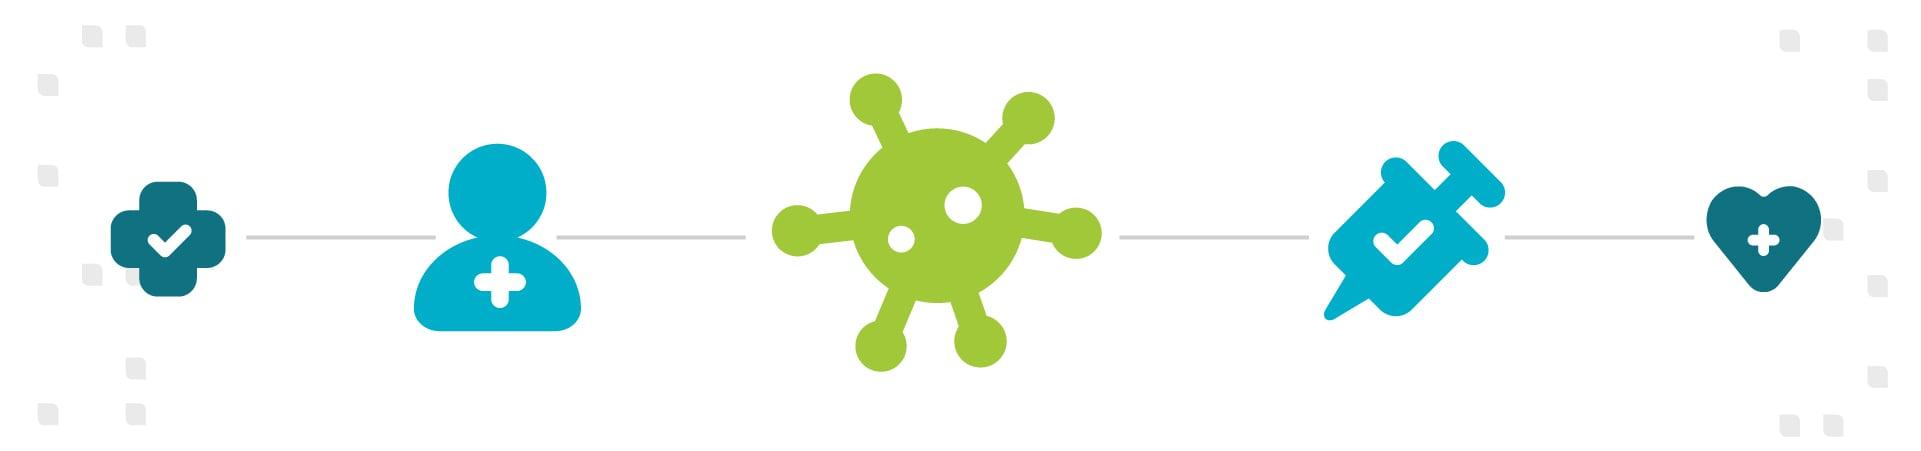 virus-wide-illustration